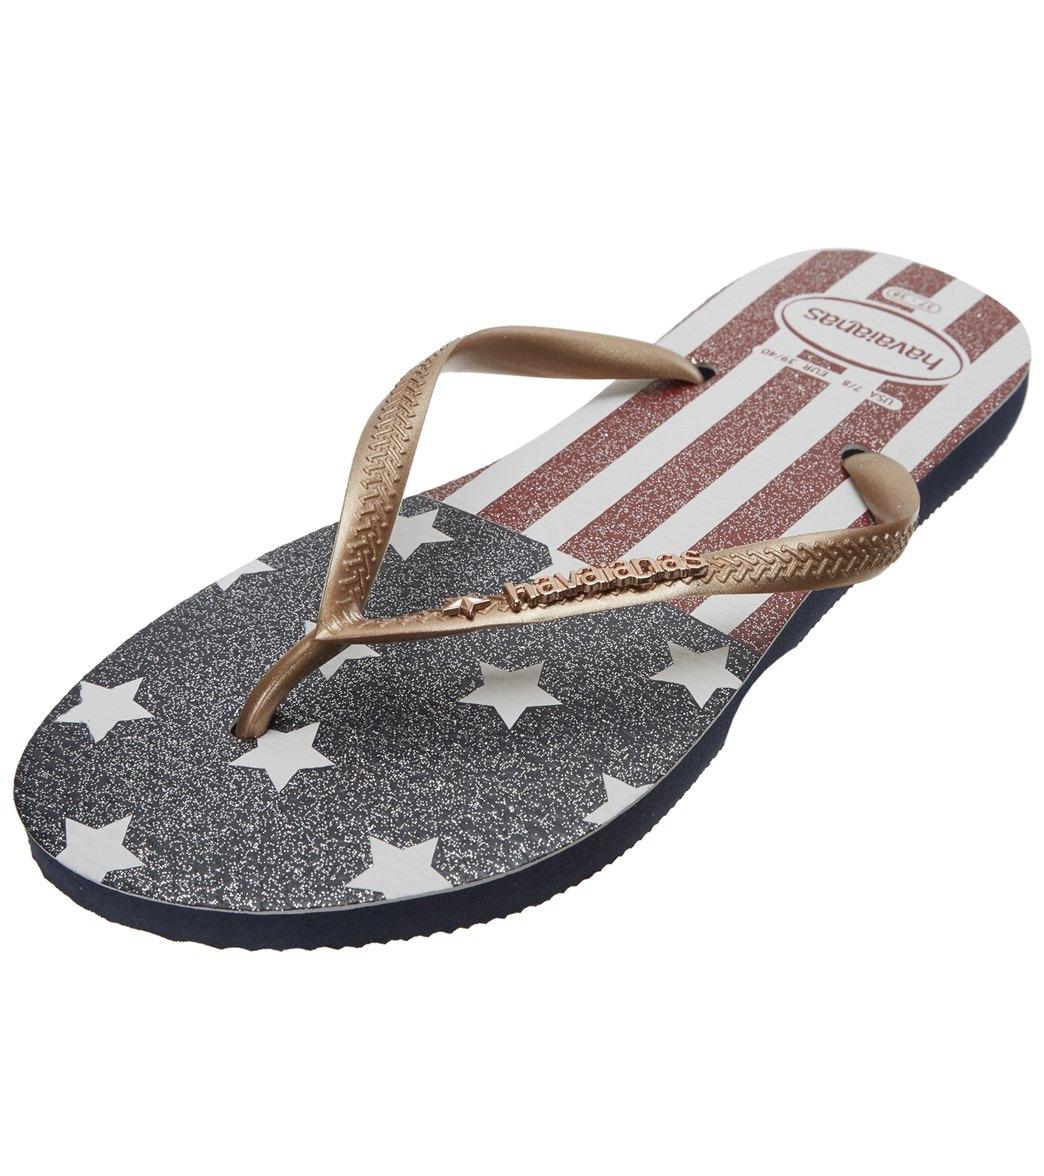 551928f836d Havaianas Women s Slim USA Glitter Flip Flop at SwimOutlet.com